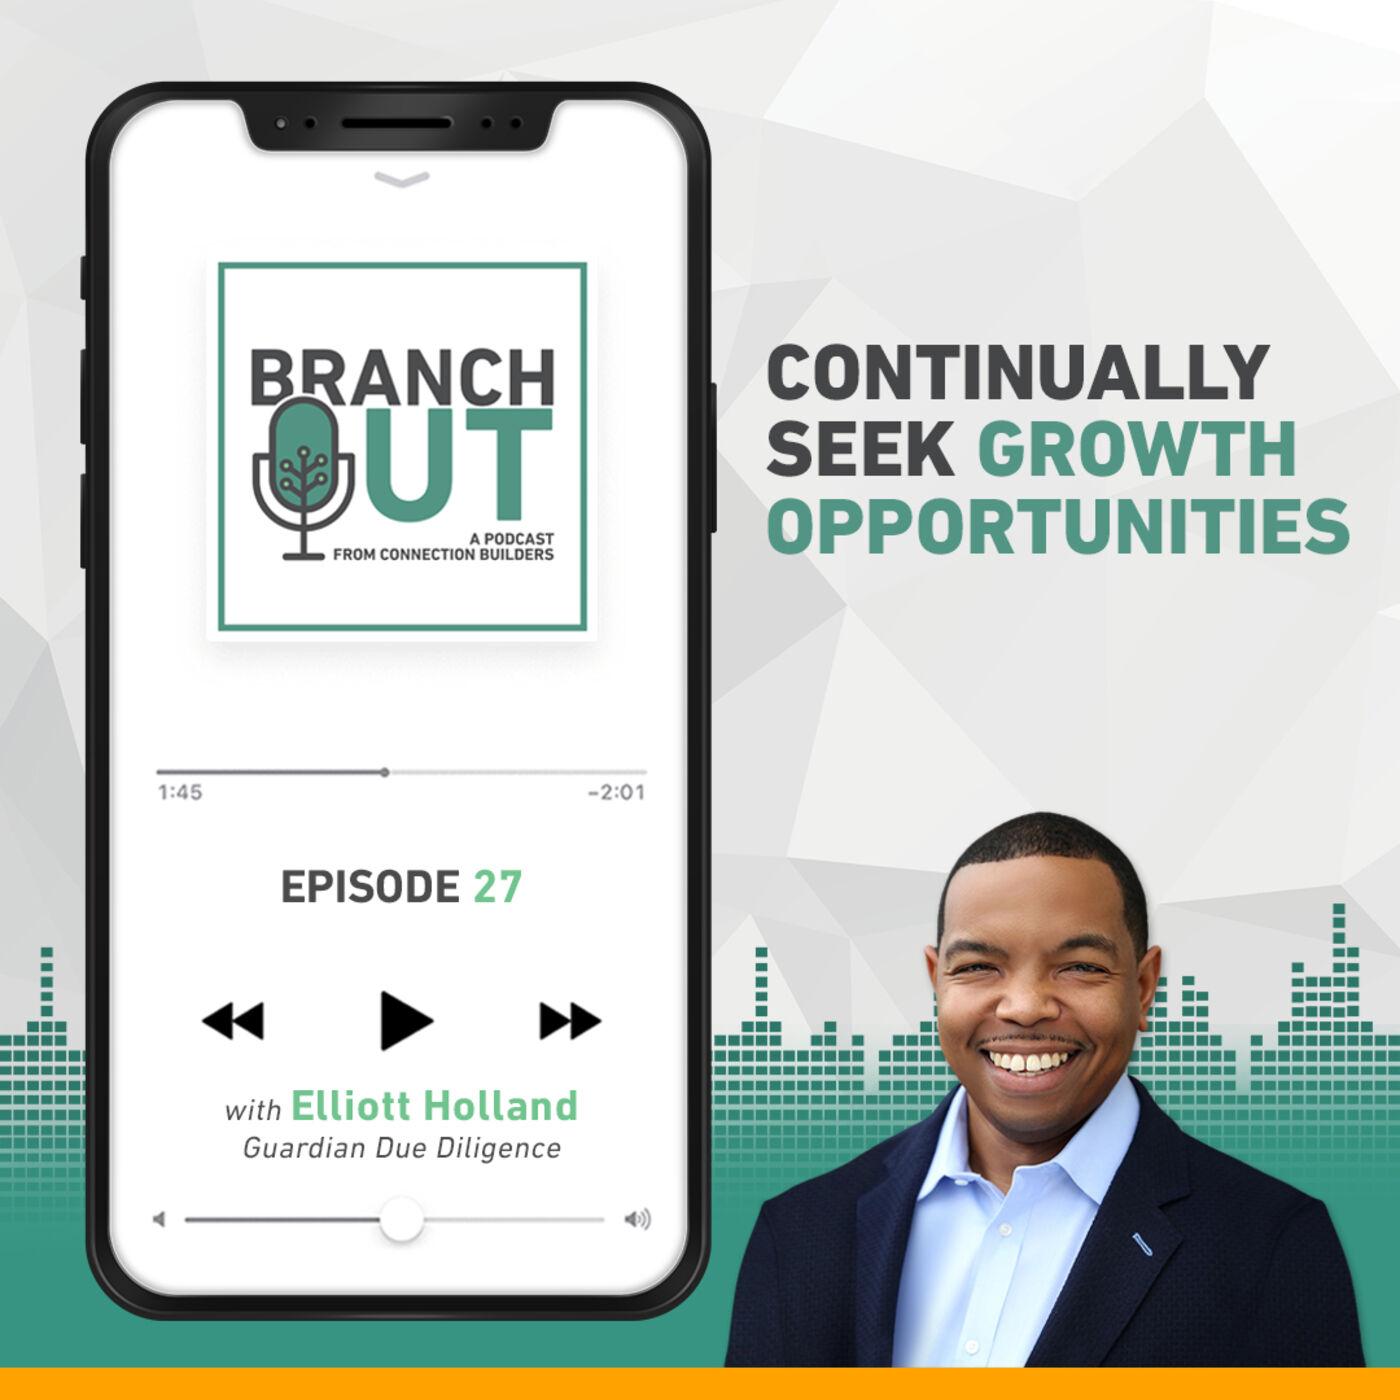 Continually Seek Growth Opportunities - Elliott Holland